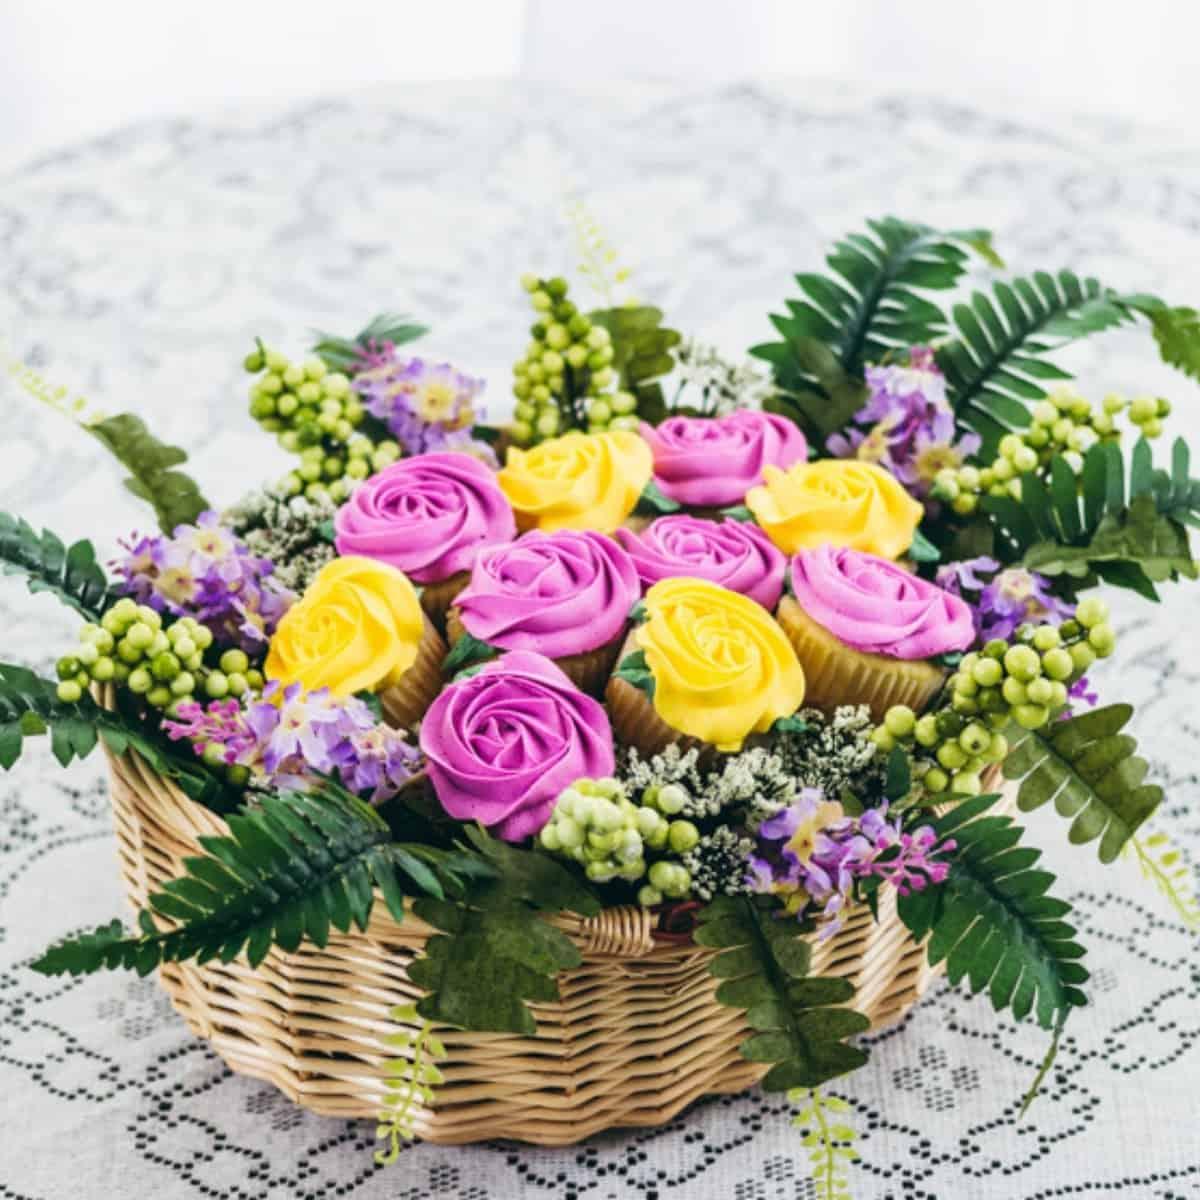 Diy Cupcake Bouquet In A Basket I Scream For Buttercream